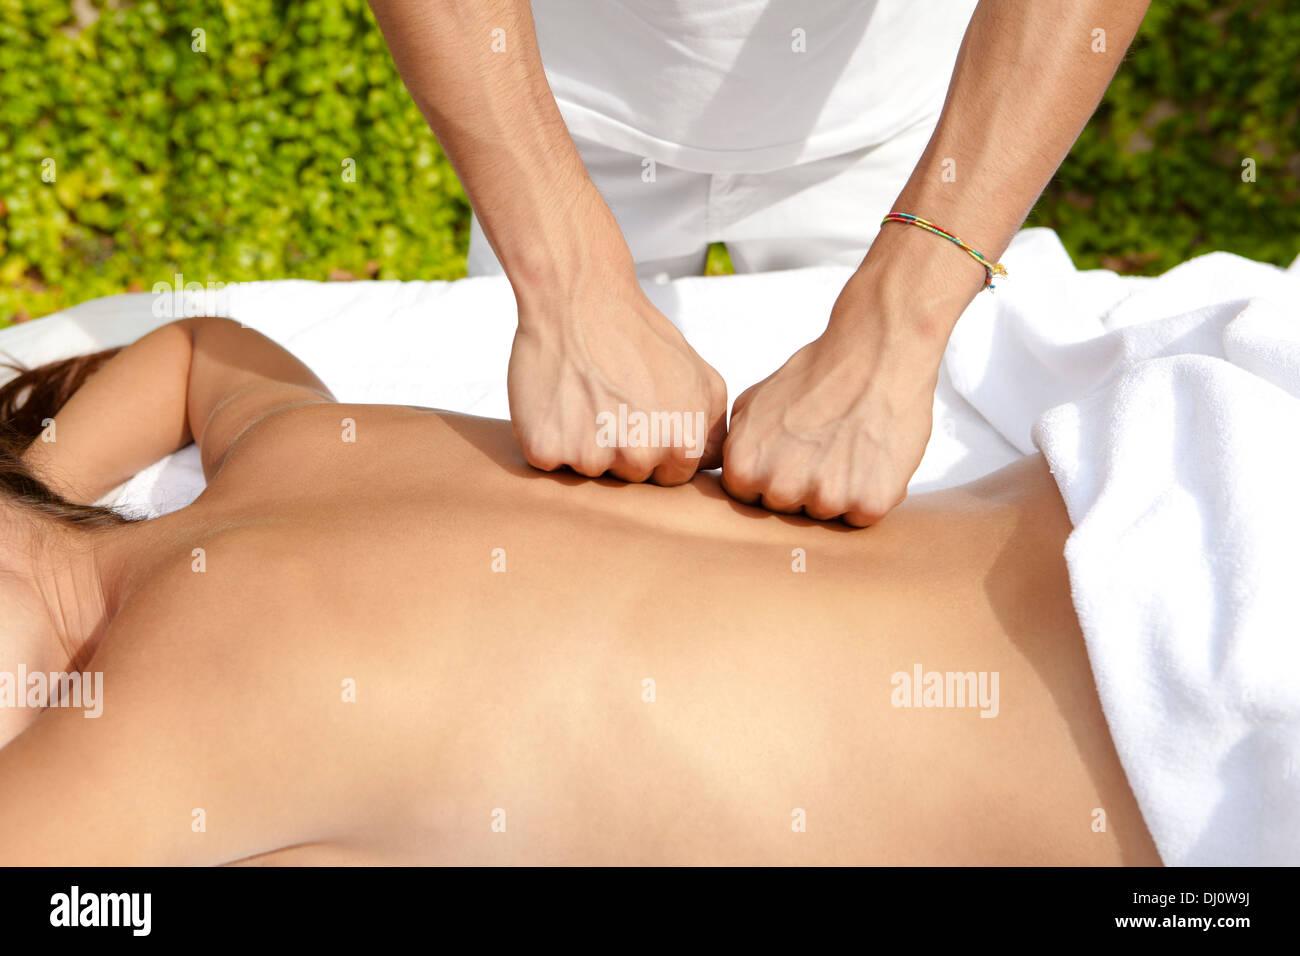 massage - Stock Image